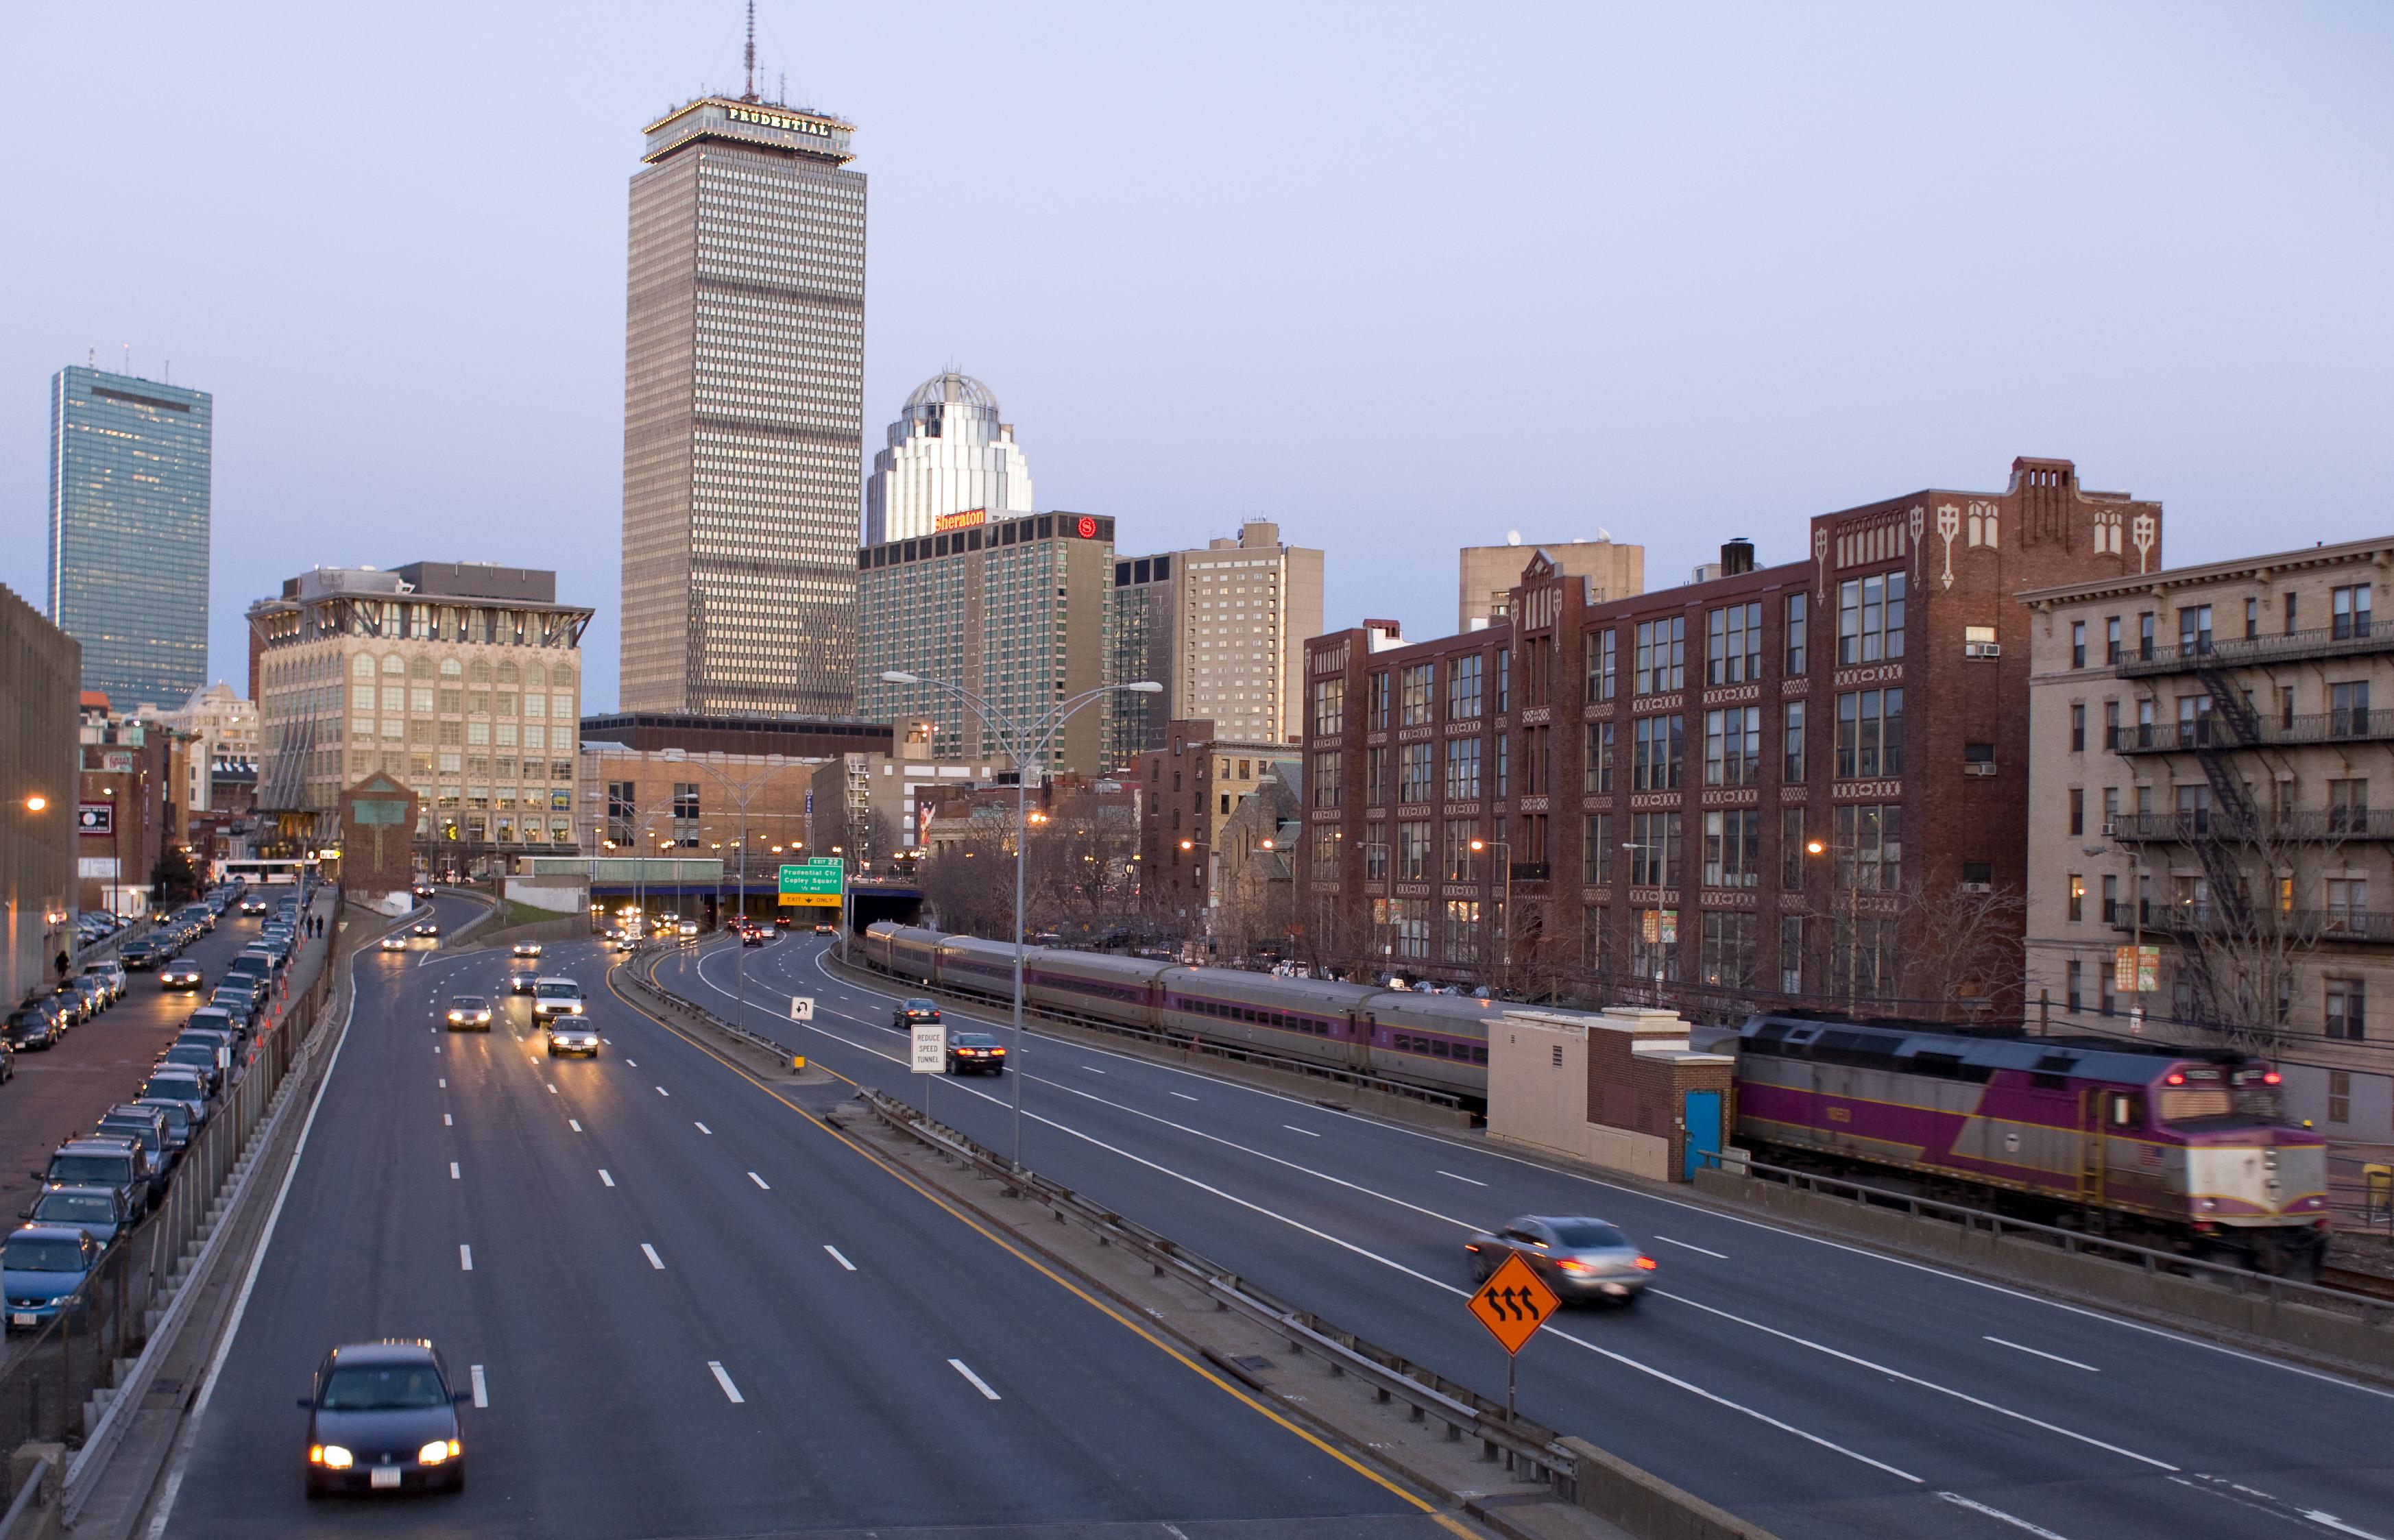 A description of the newbury street in downtown boston